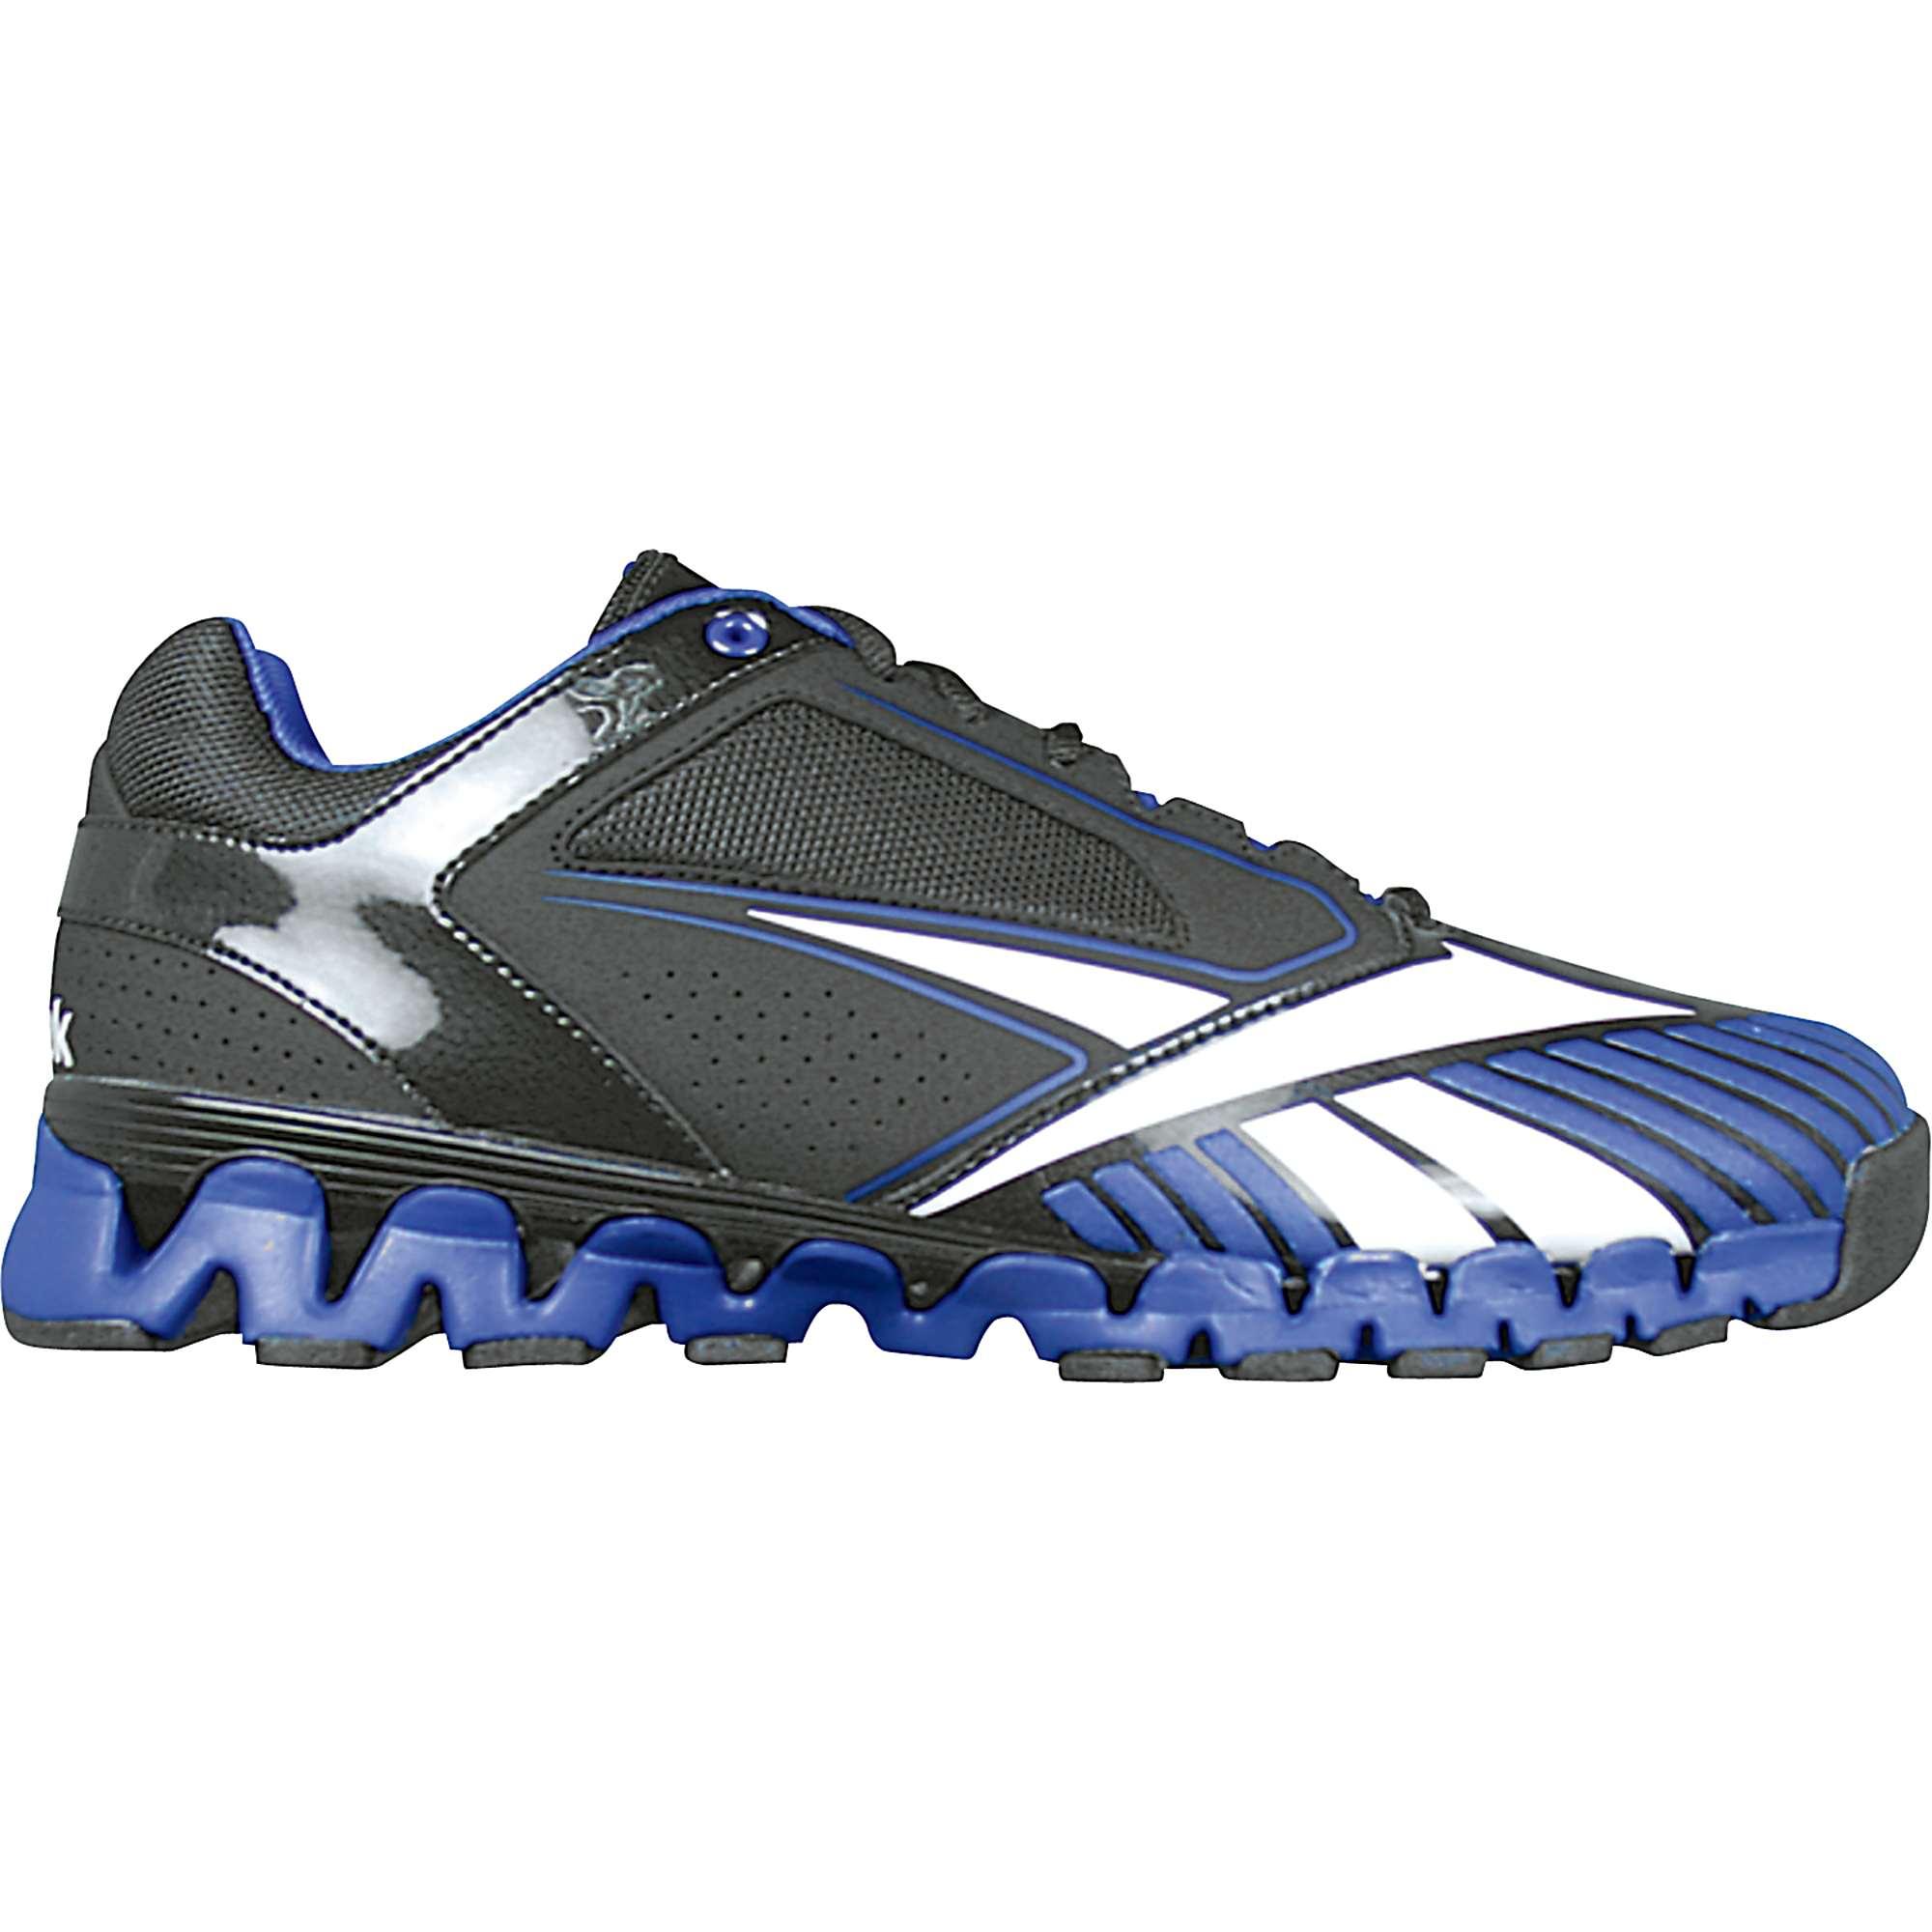 reebok zig zag referee shoes on sale